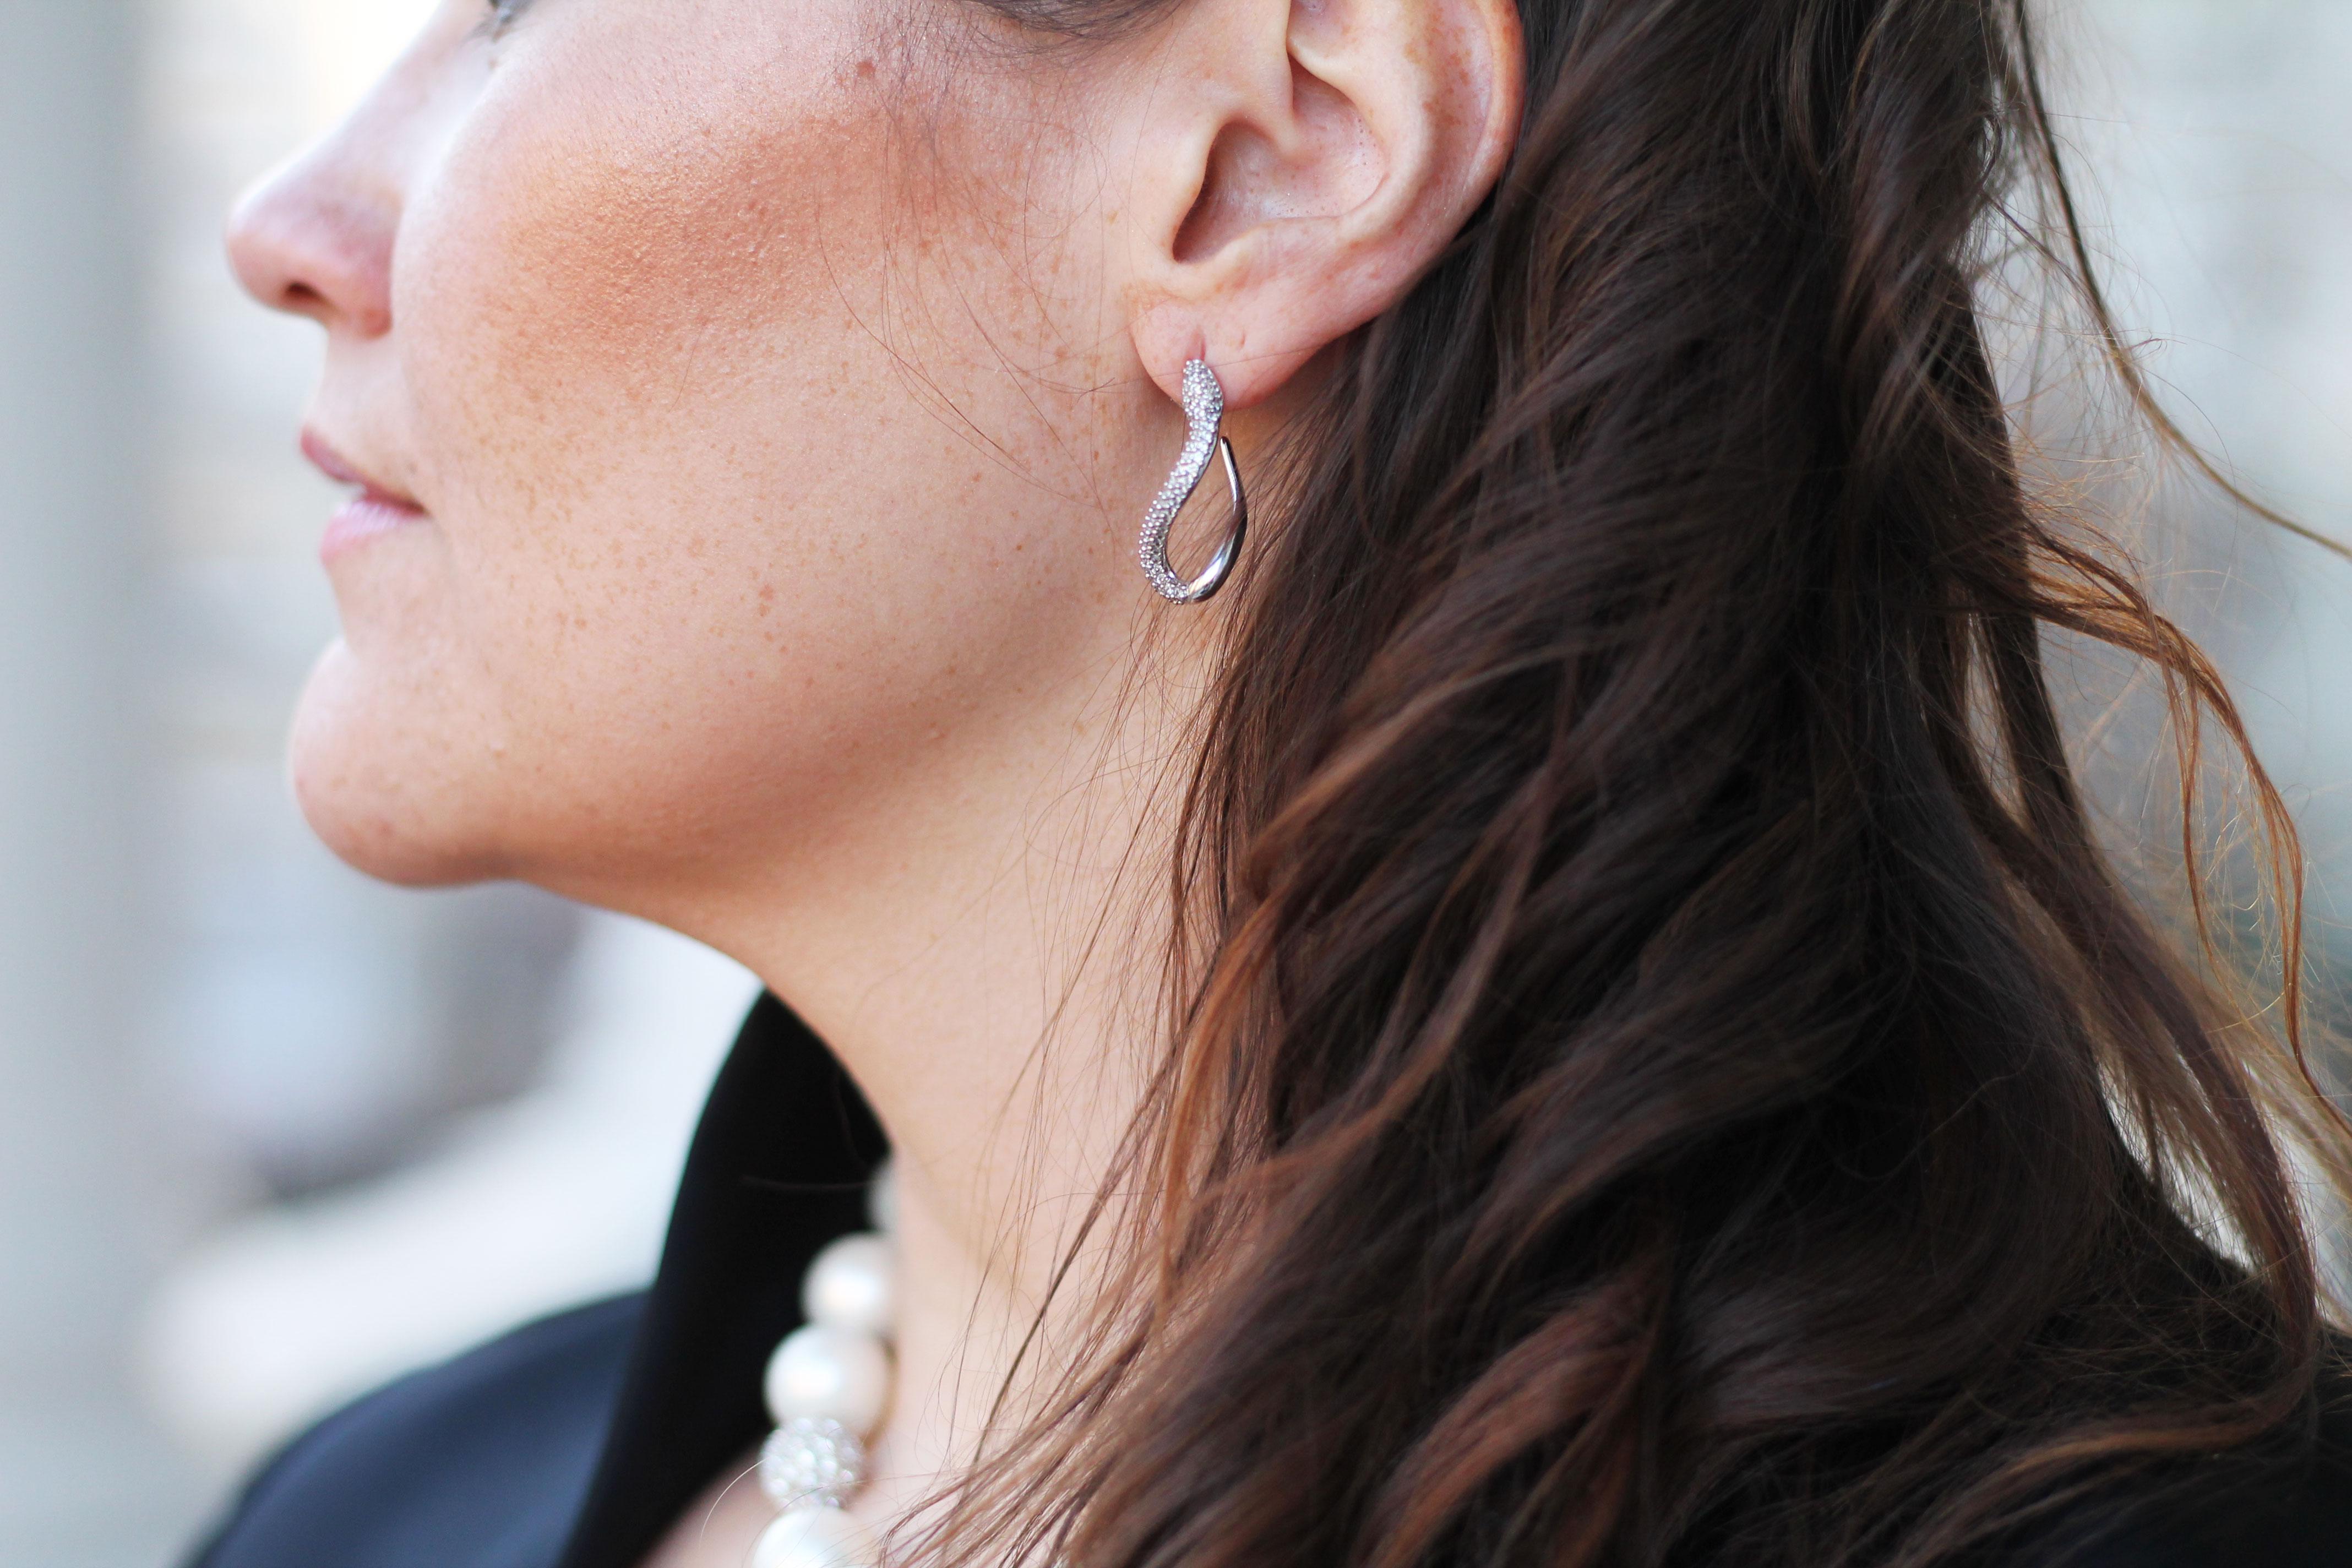 swarovski-ohrringe-balloutfit-locken-frisur-perlenkette-kardiaserena-plussize-blogger-fashion-outfit